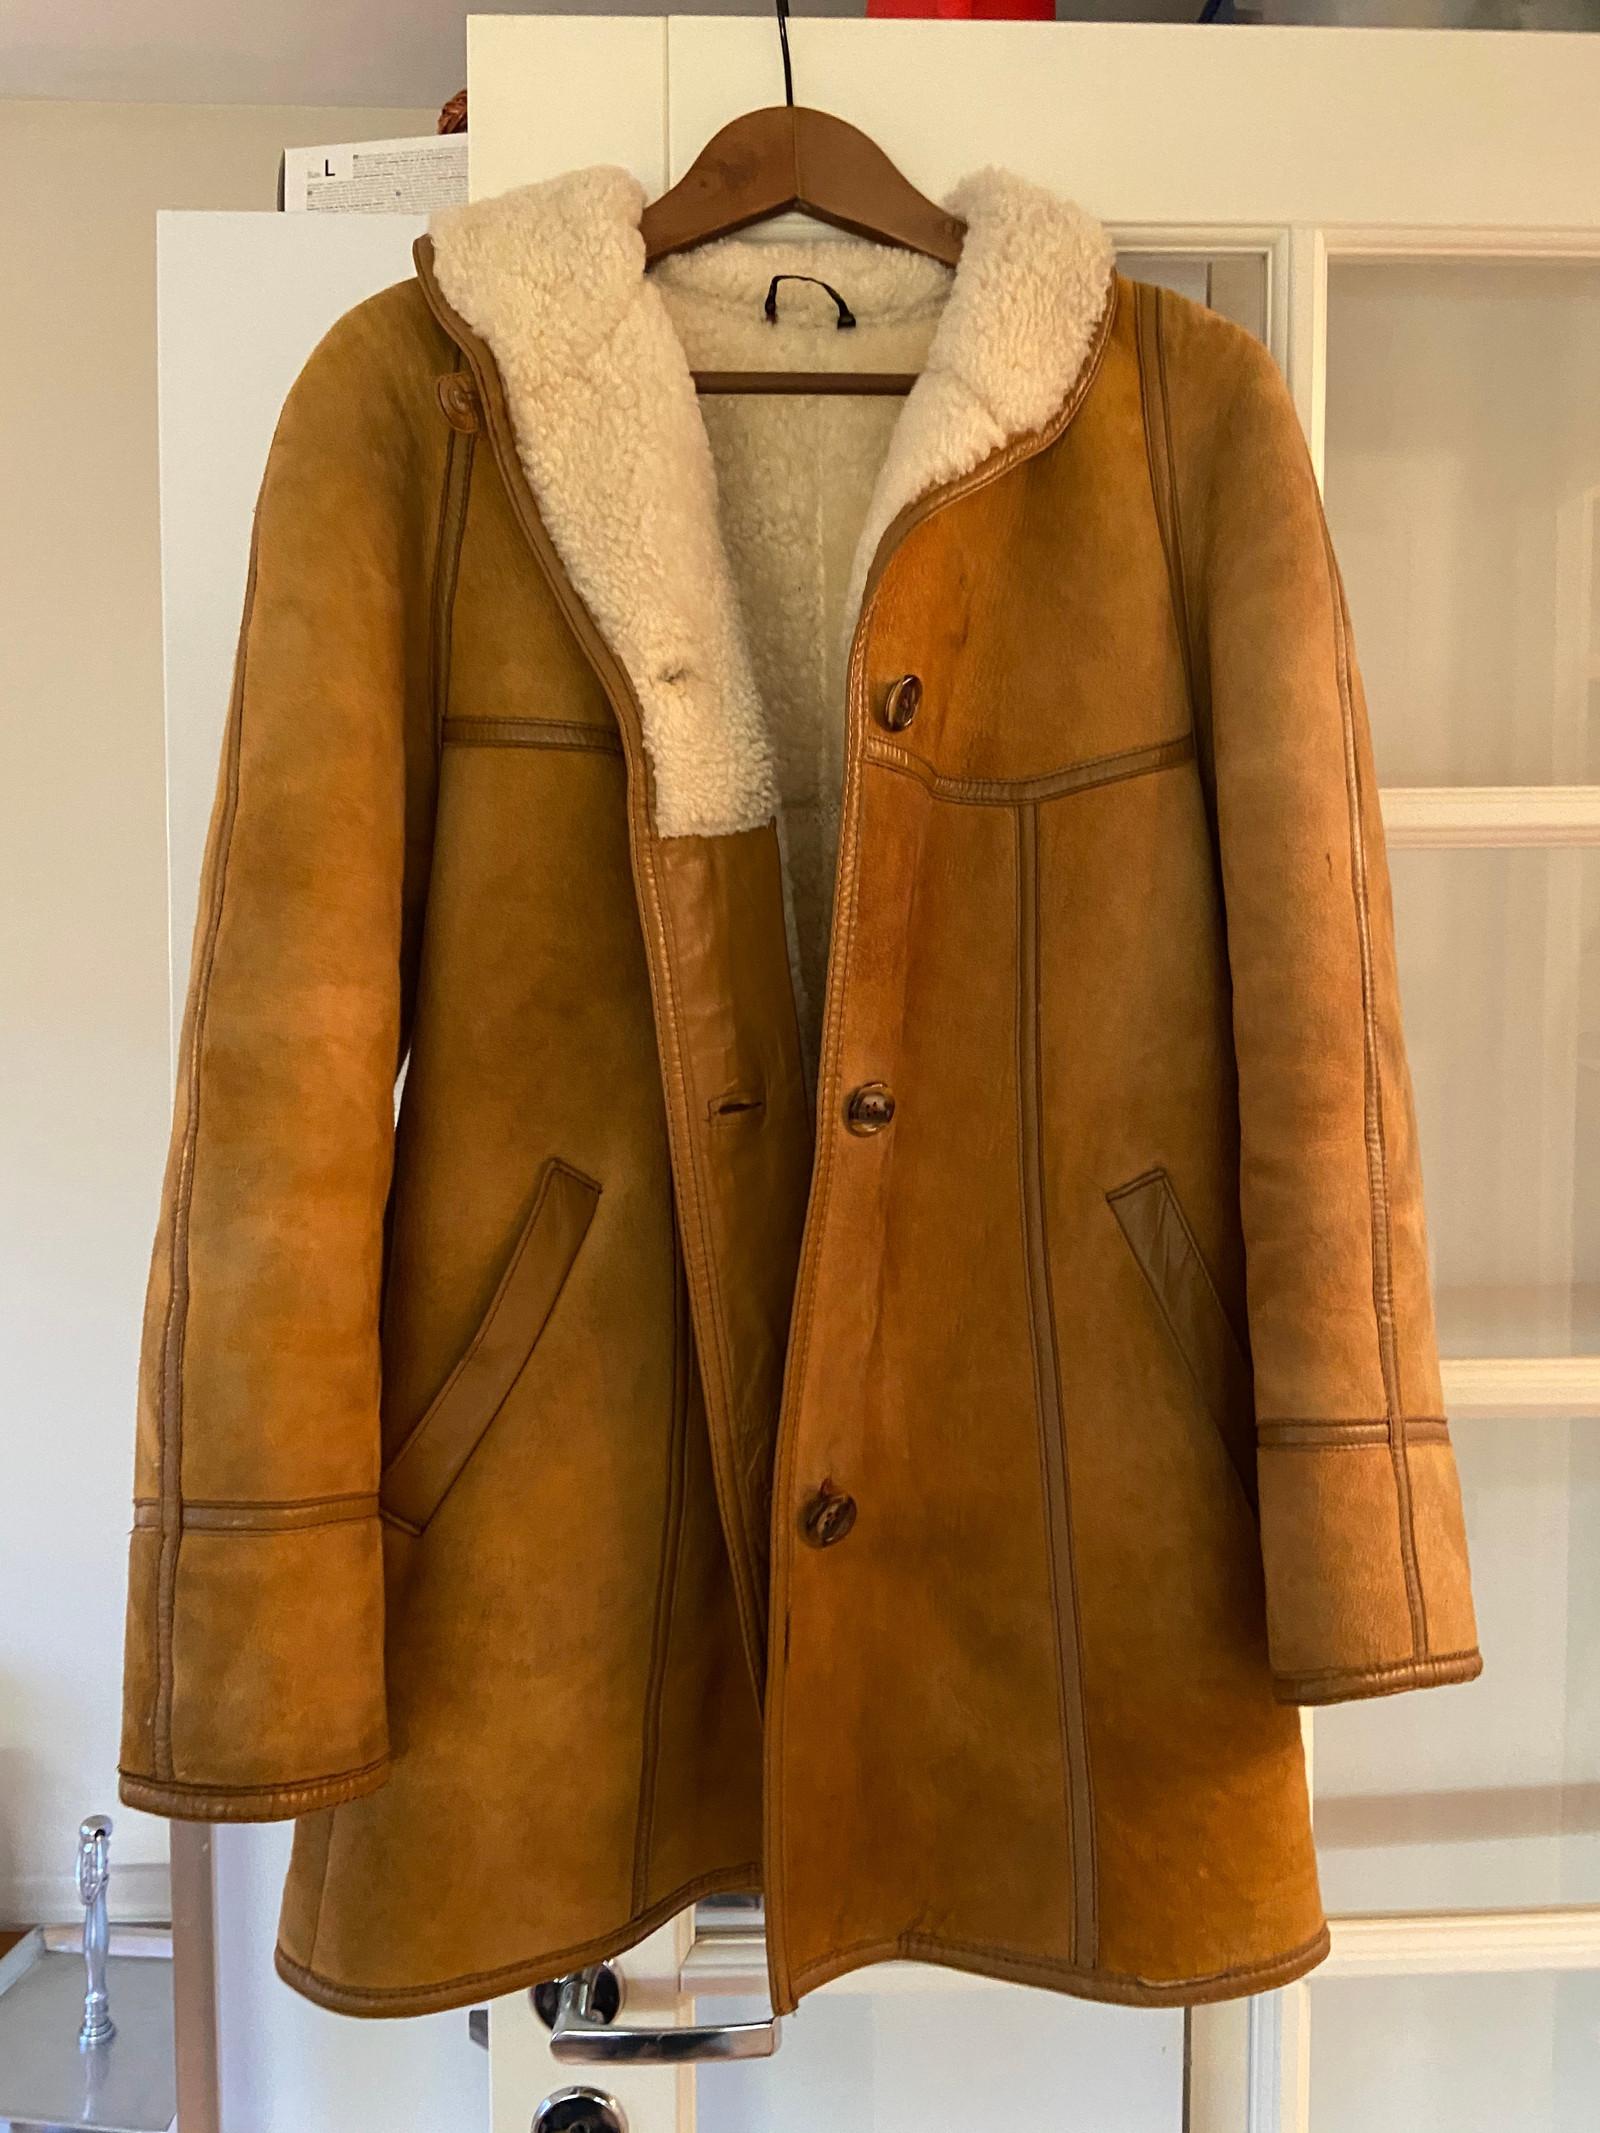 Aleksander semsket jakke fra 80 tallet | FINN.no